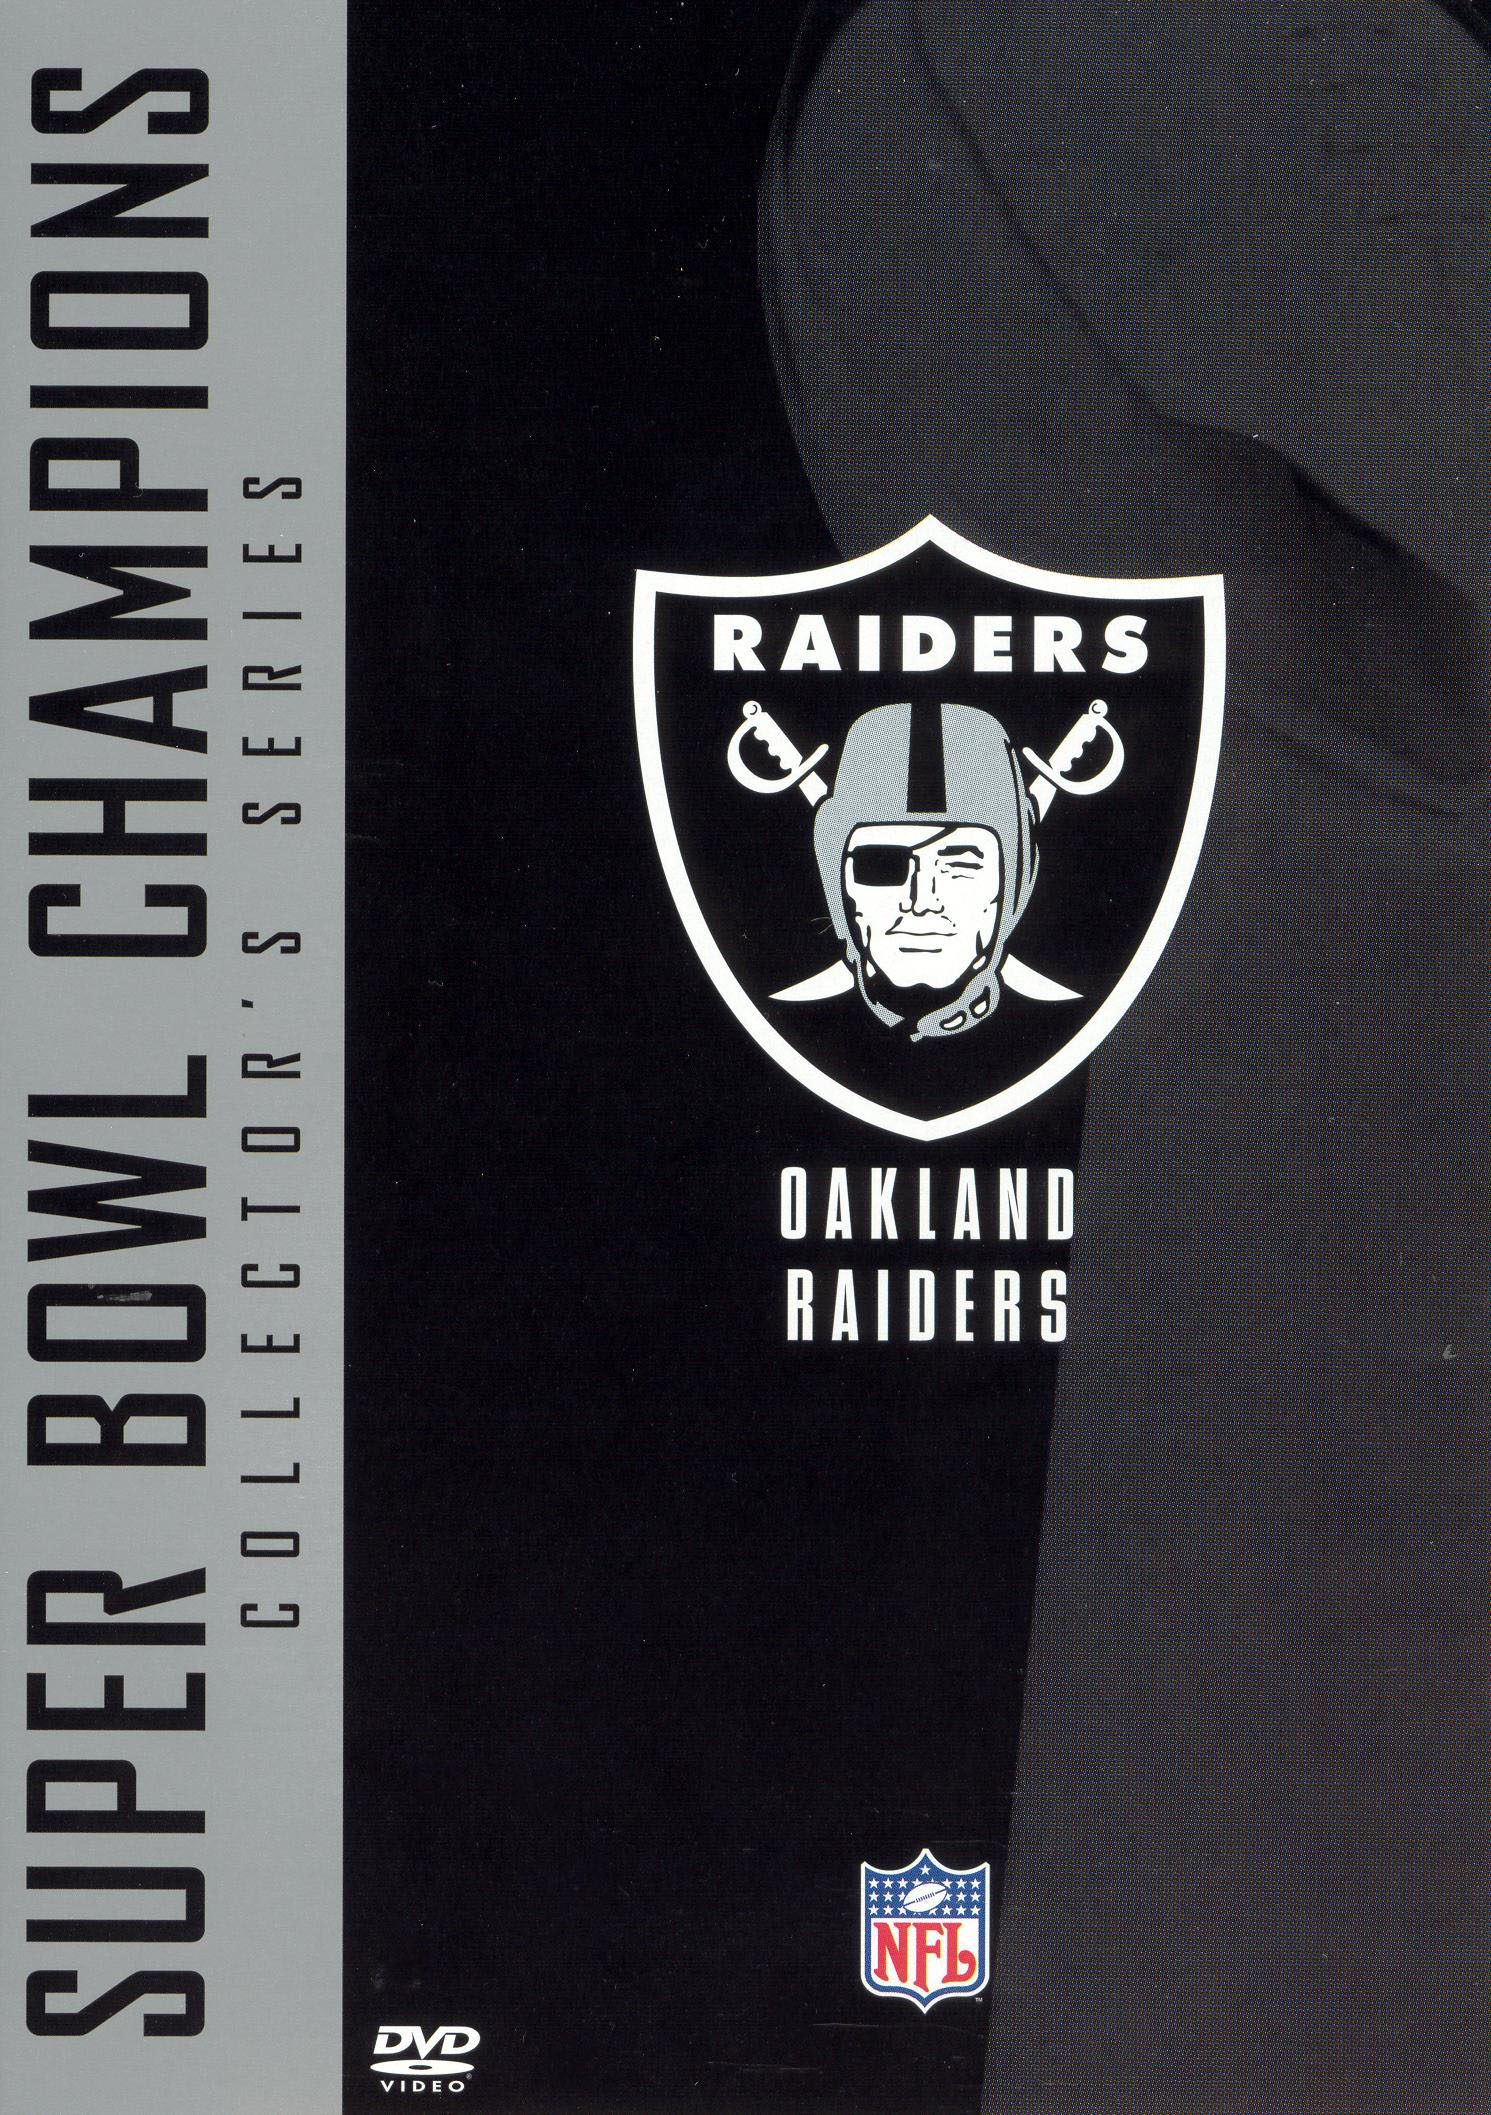 NFL: Super Bowl Champions - Oakland Raiders